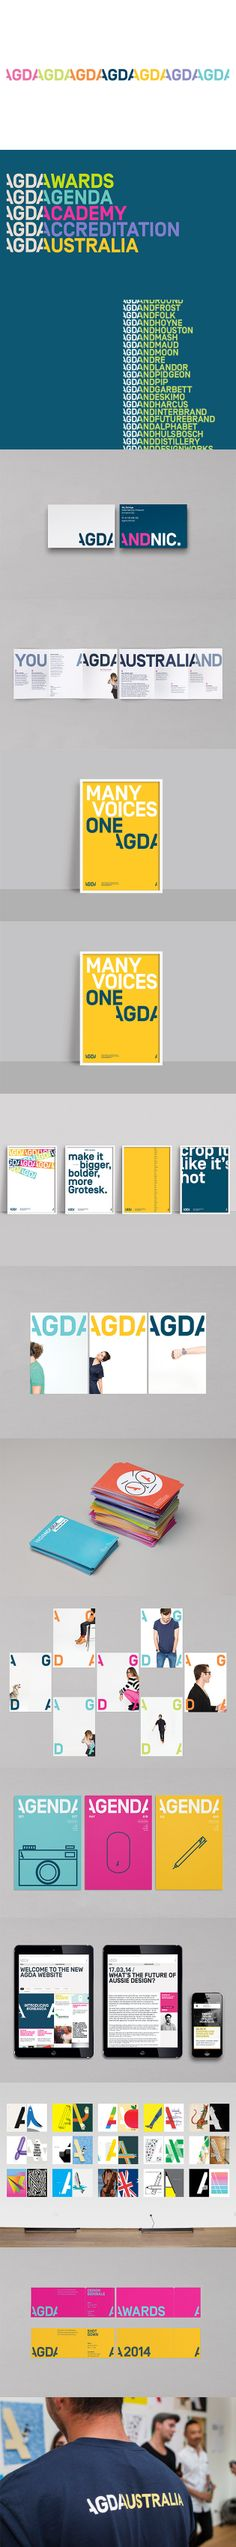 AGDA rebrand by Interbrand